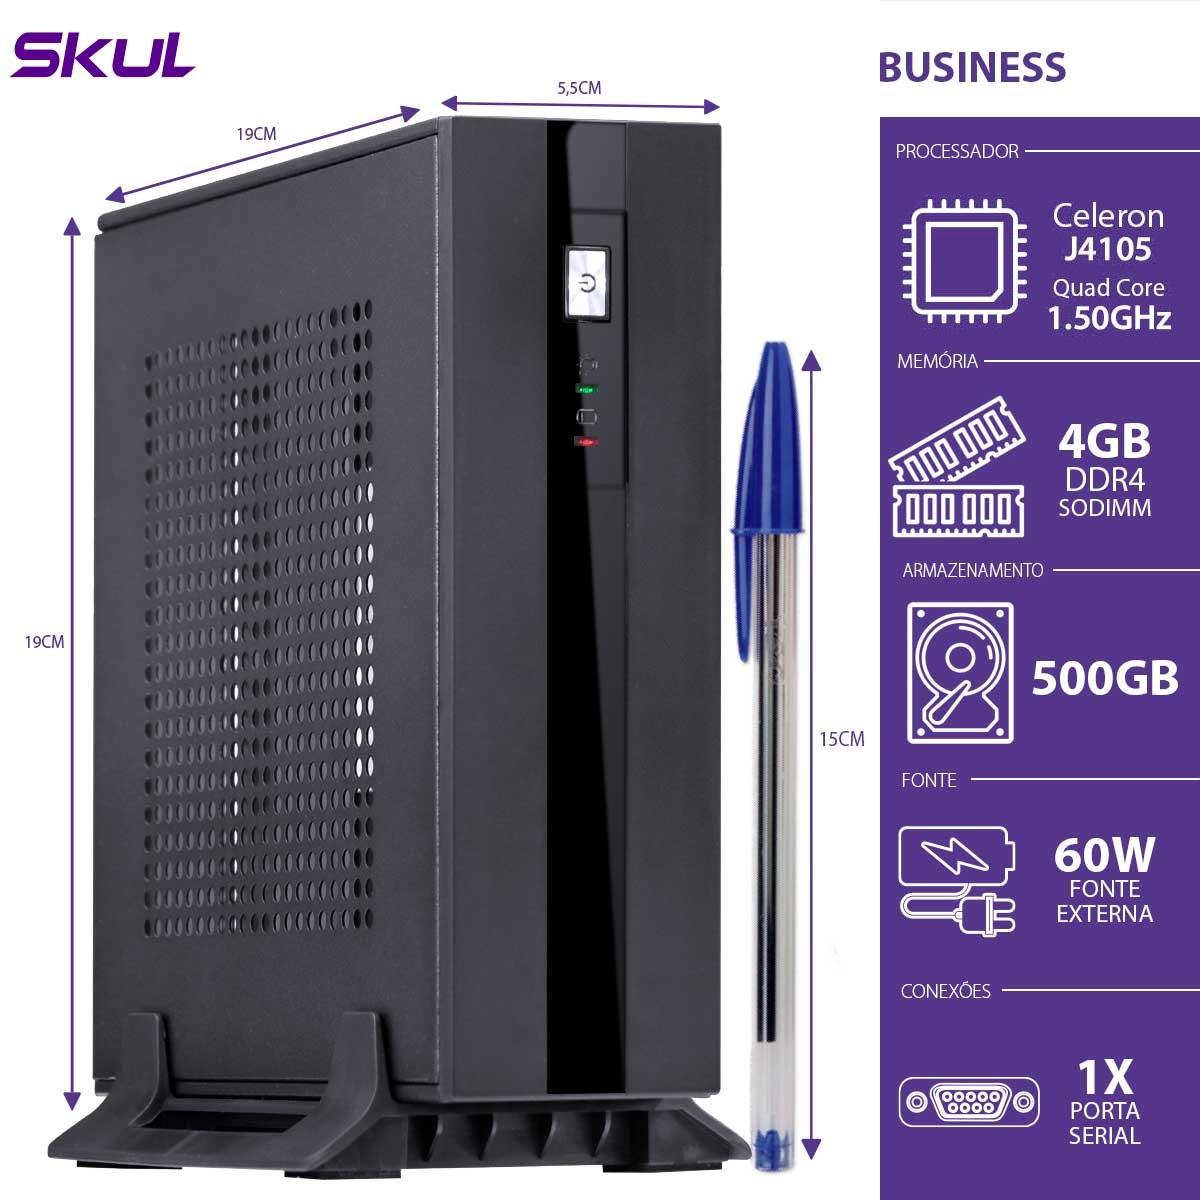 MINI COMPUTADOR BUSINESS B100 - CELERON QUAD CORE J4105 1.50GHZ 4GB DDR4 SODIMM HD 500GB PORTA SERIAL FONTE EXT.60W